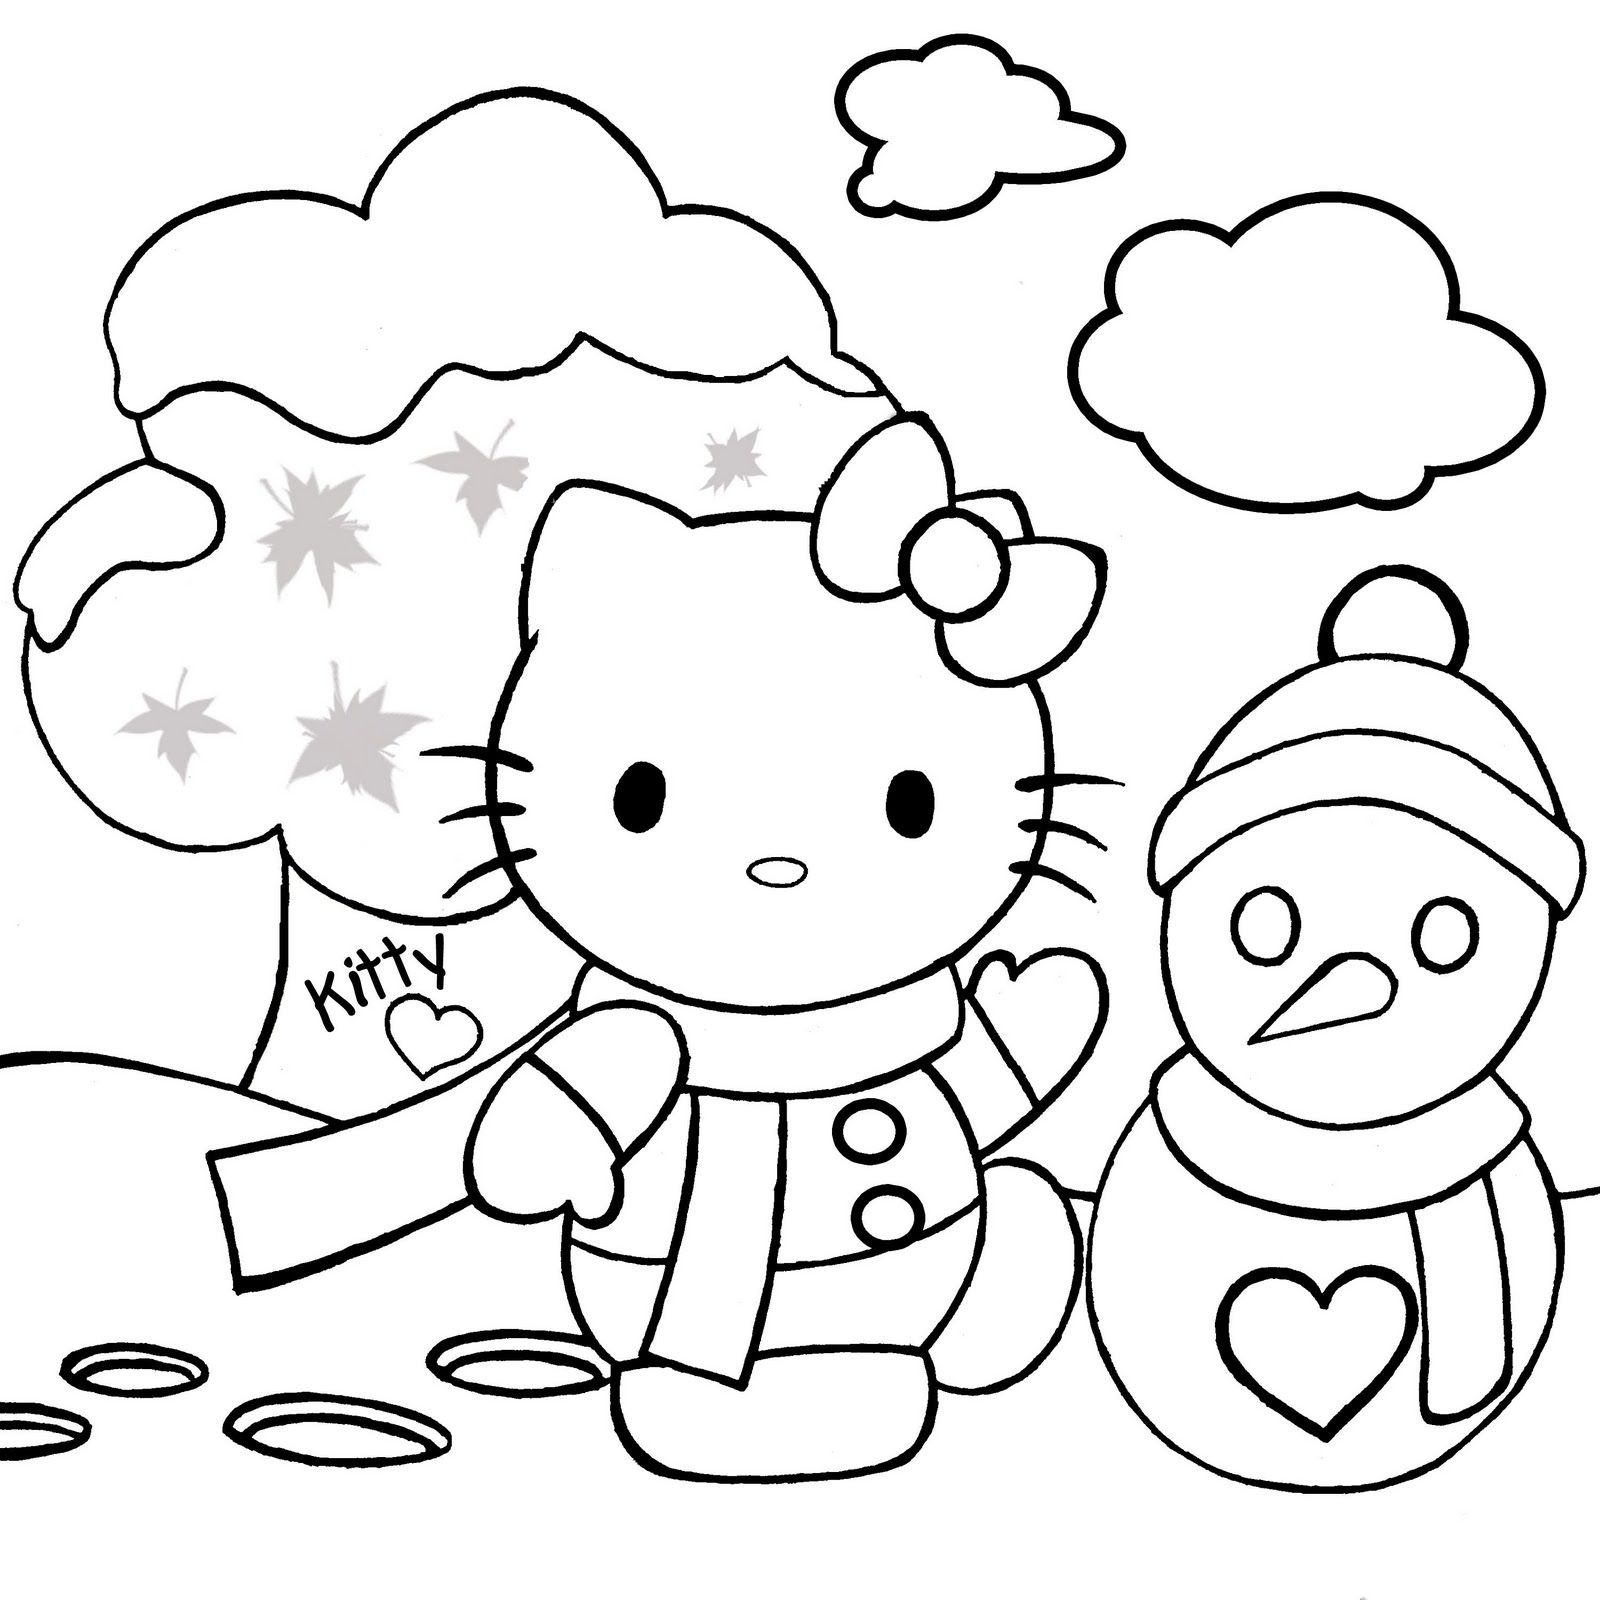 Http 3 Bp Blogspot Com Qt0jqve0whu Tu3 O130j0i Aaaaaaaabt0 Ixcd5yuauue S1600 H Hello Kitty Colouring Pages Hello Kitty Coloring Christmas Tree Coloring Page